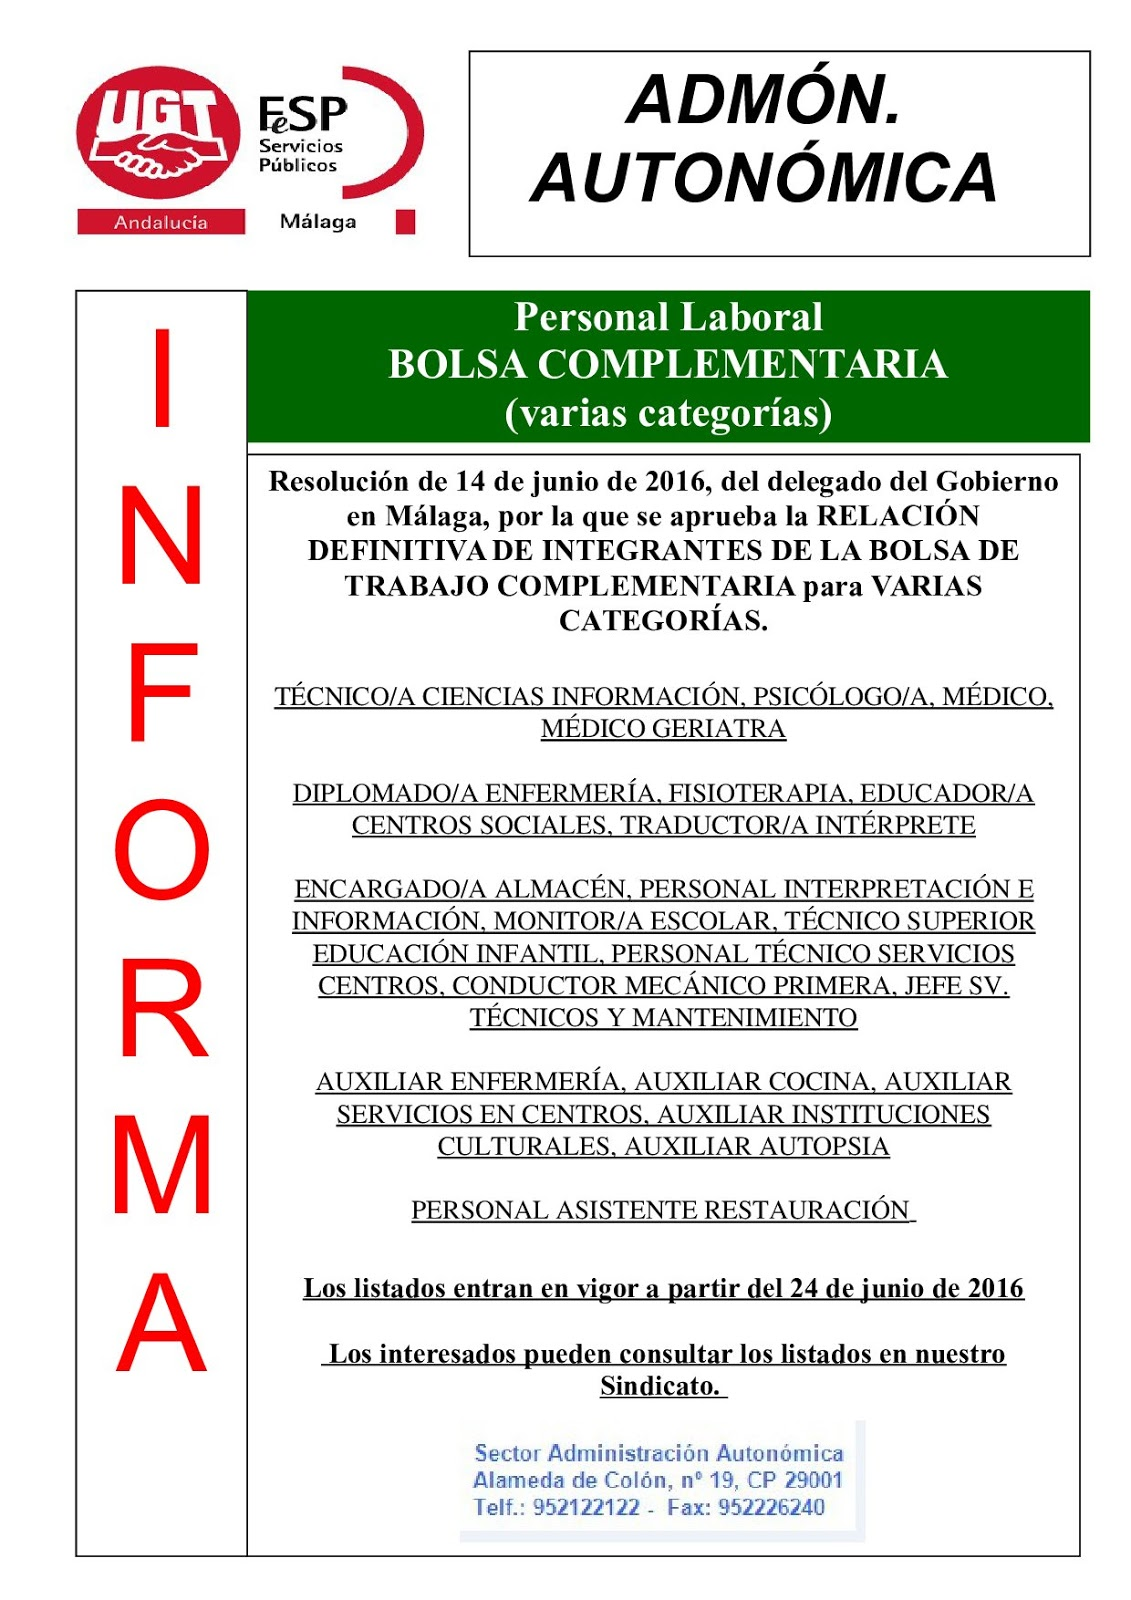 Blog de salva jim nez bolsas de trabajo complementarias definitivas varias categor as m laga - Ofertas de empleo jefe de cocina ...